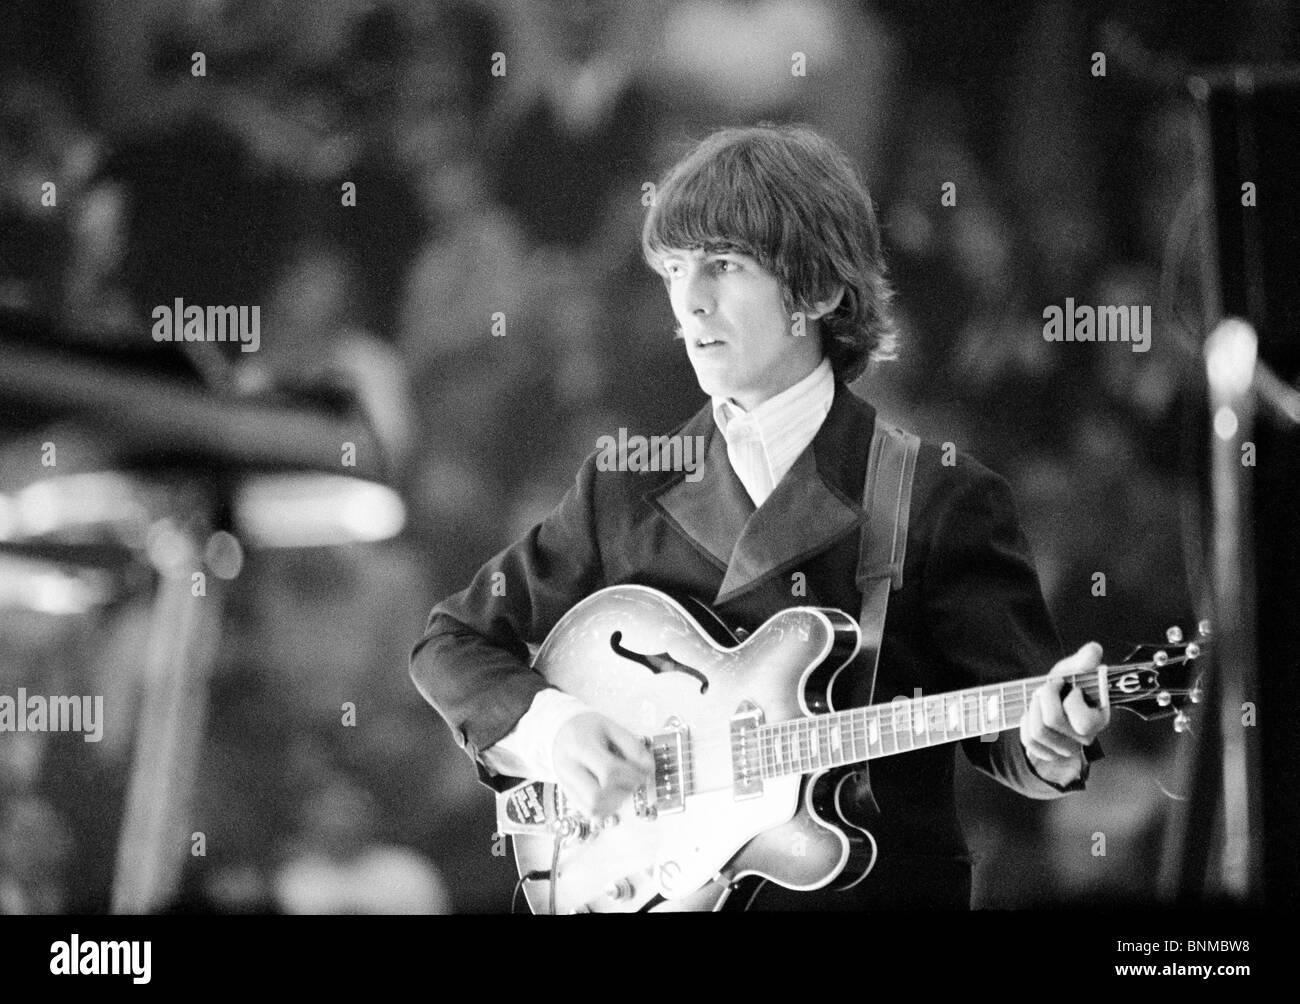 The Beatles music pop group band concert Germany Essen 1966 George Harrison guitar guitarist - Stock Image